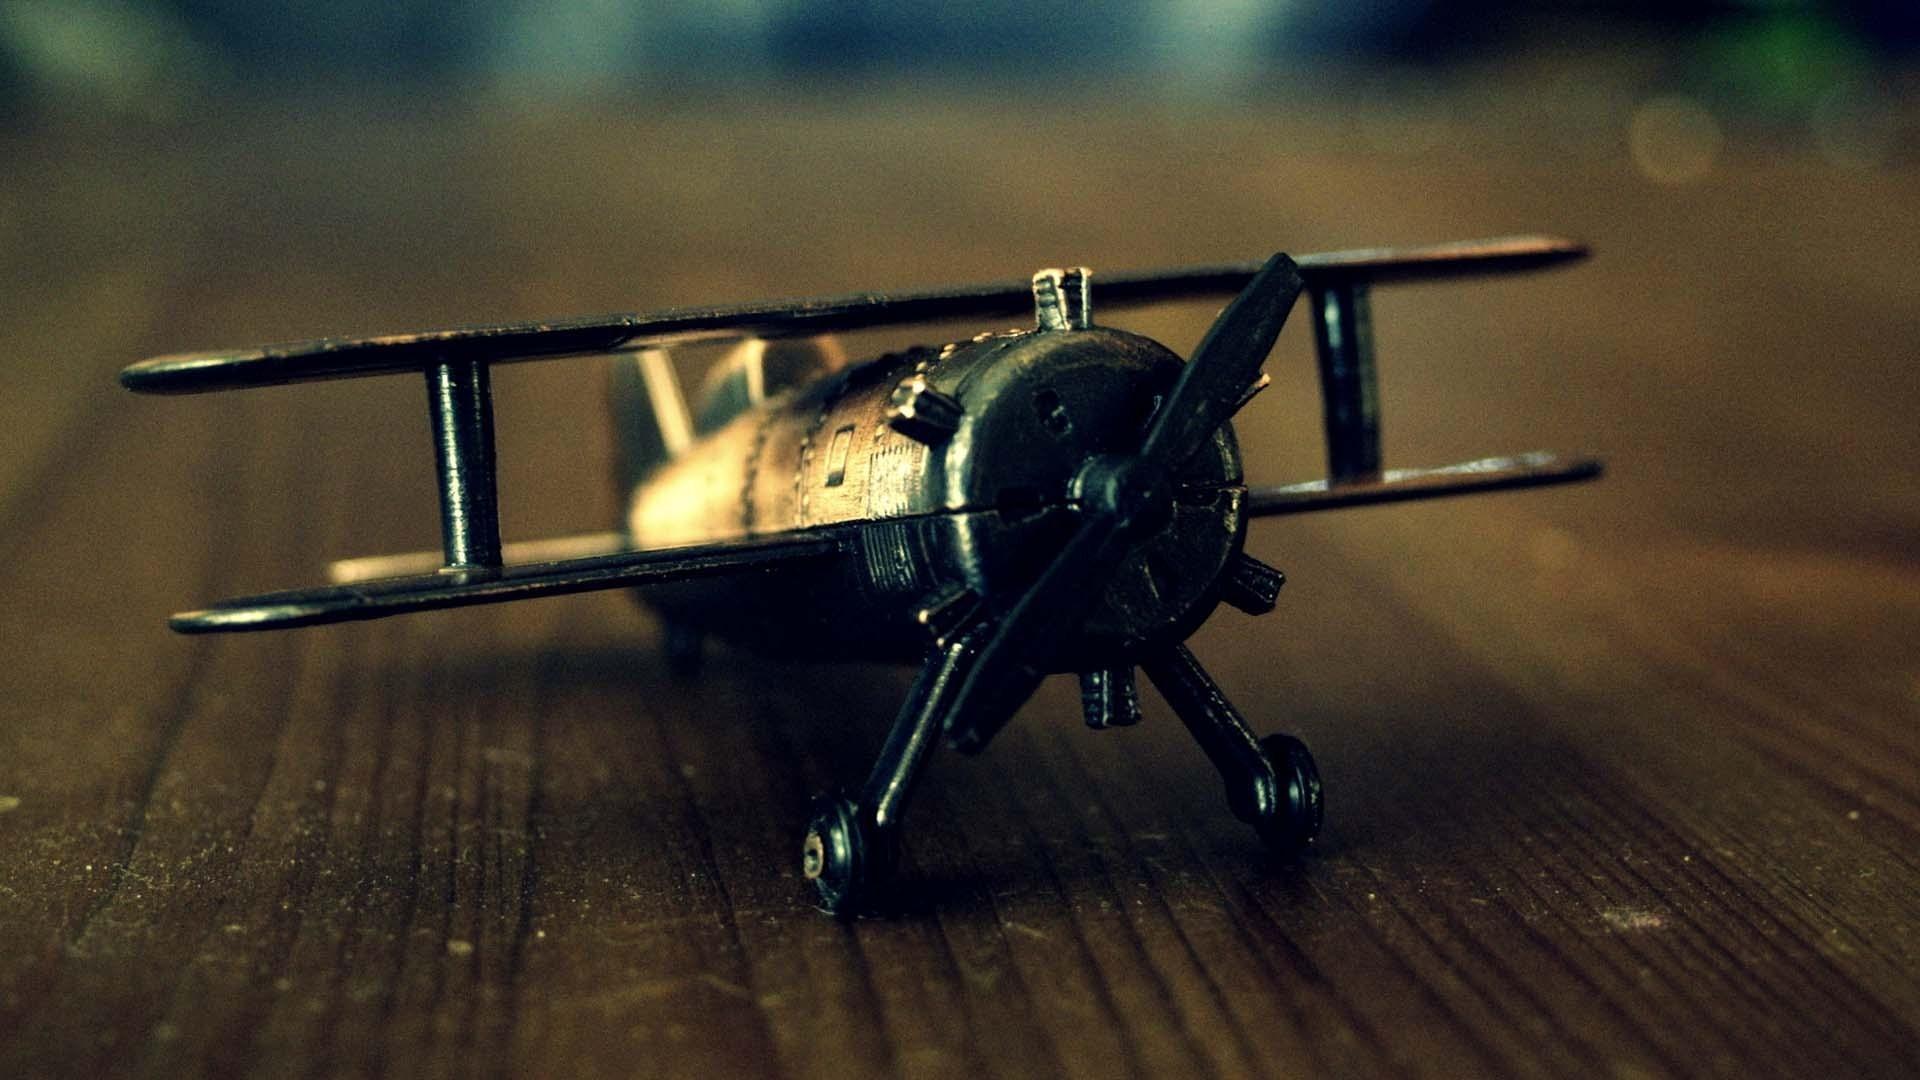 Airplane model toy mood hd wallpaper